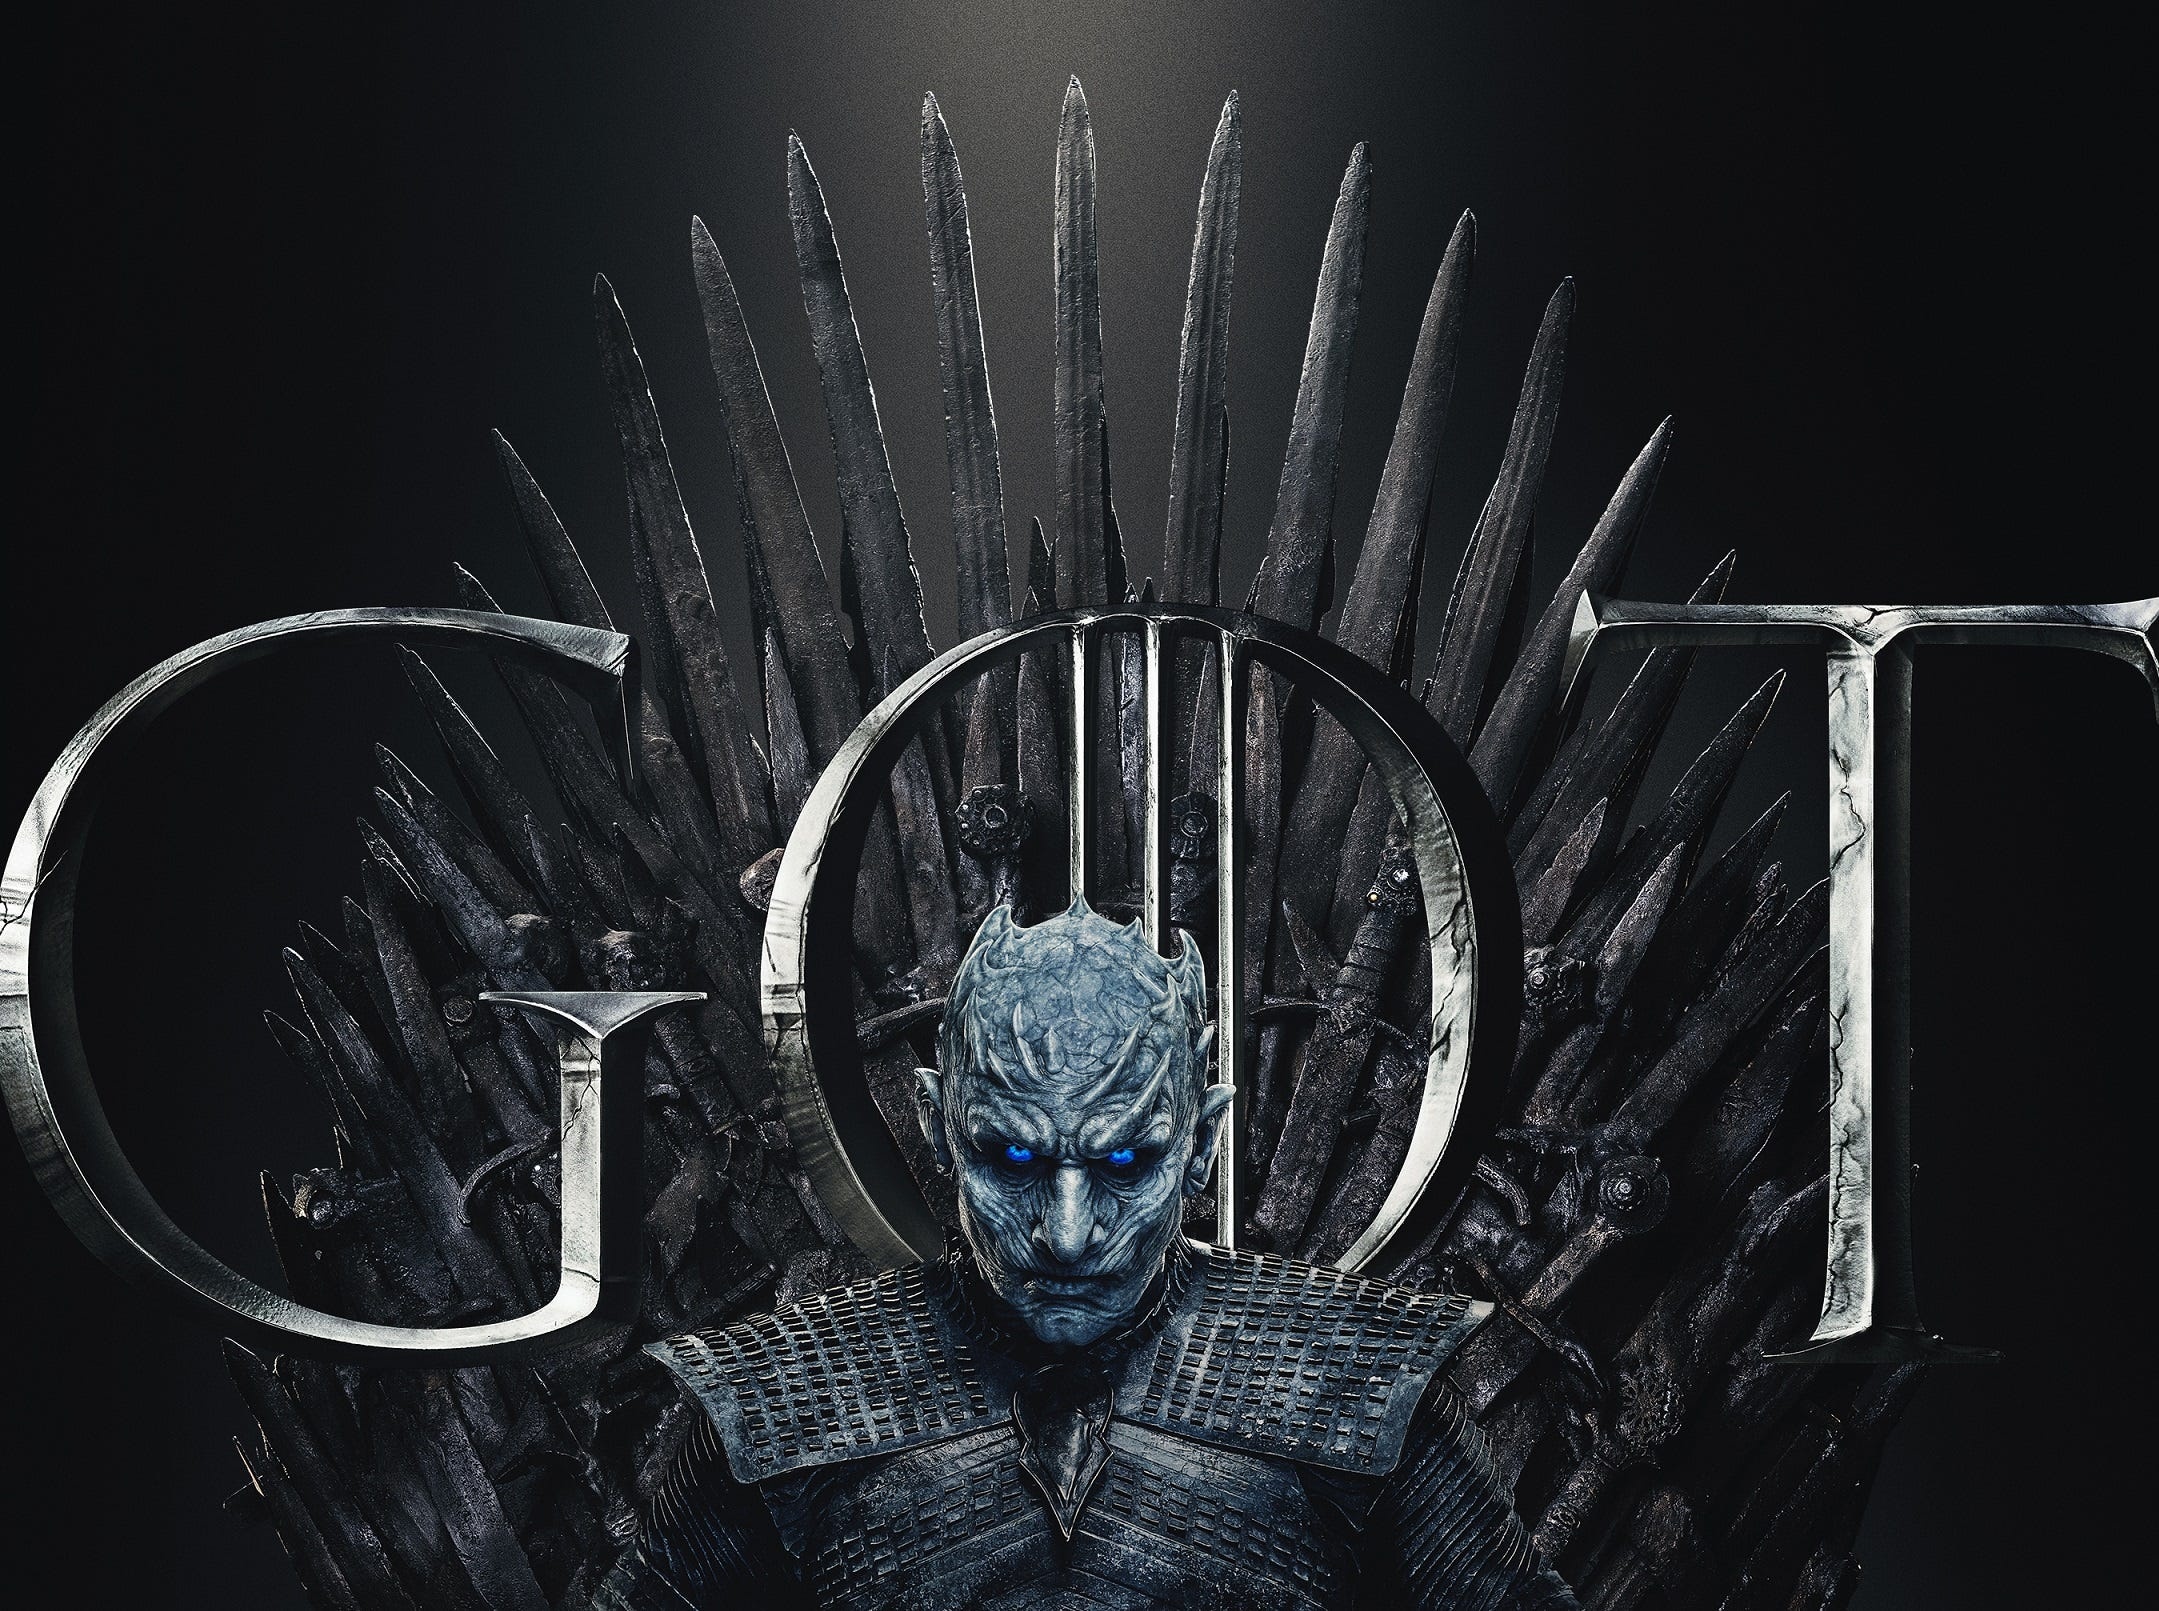 Also ready? The Night King (Vladimir Furdik) looks terrifying as ever on the throne.